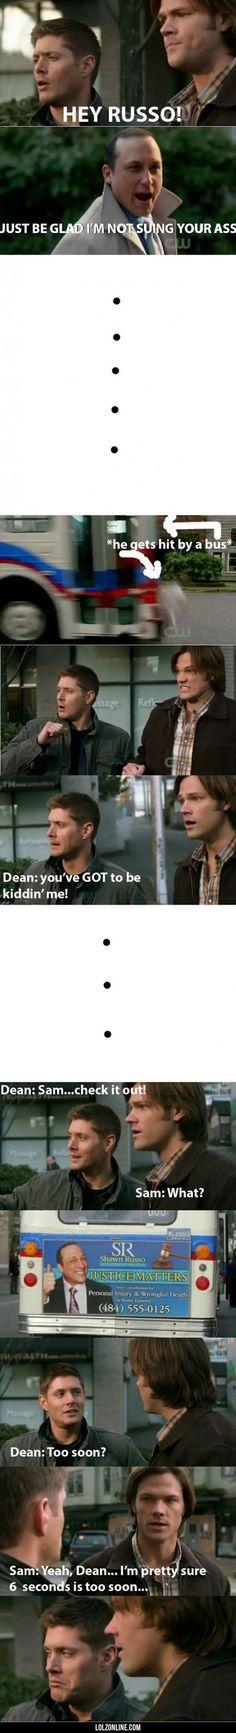 I Think Thats Too Soon #lol #haha #funny